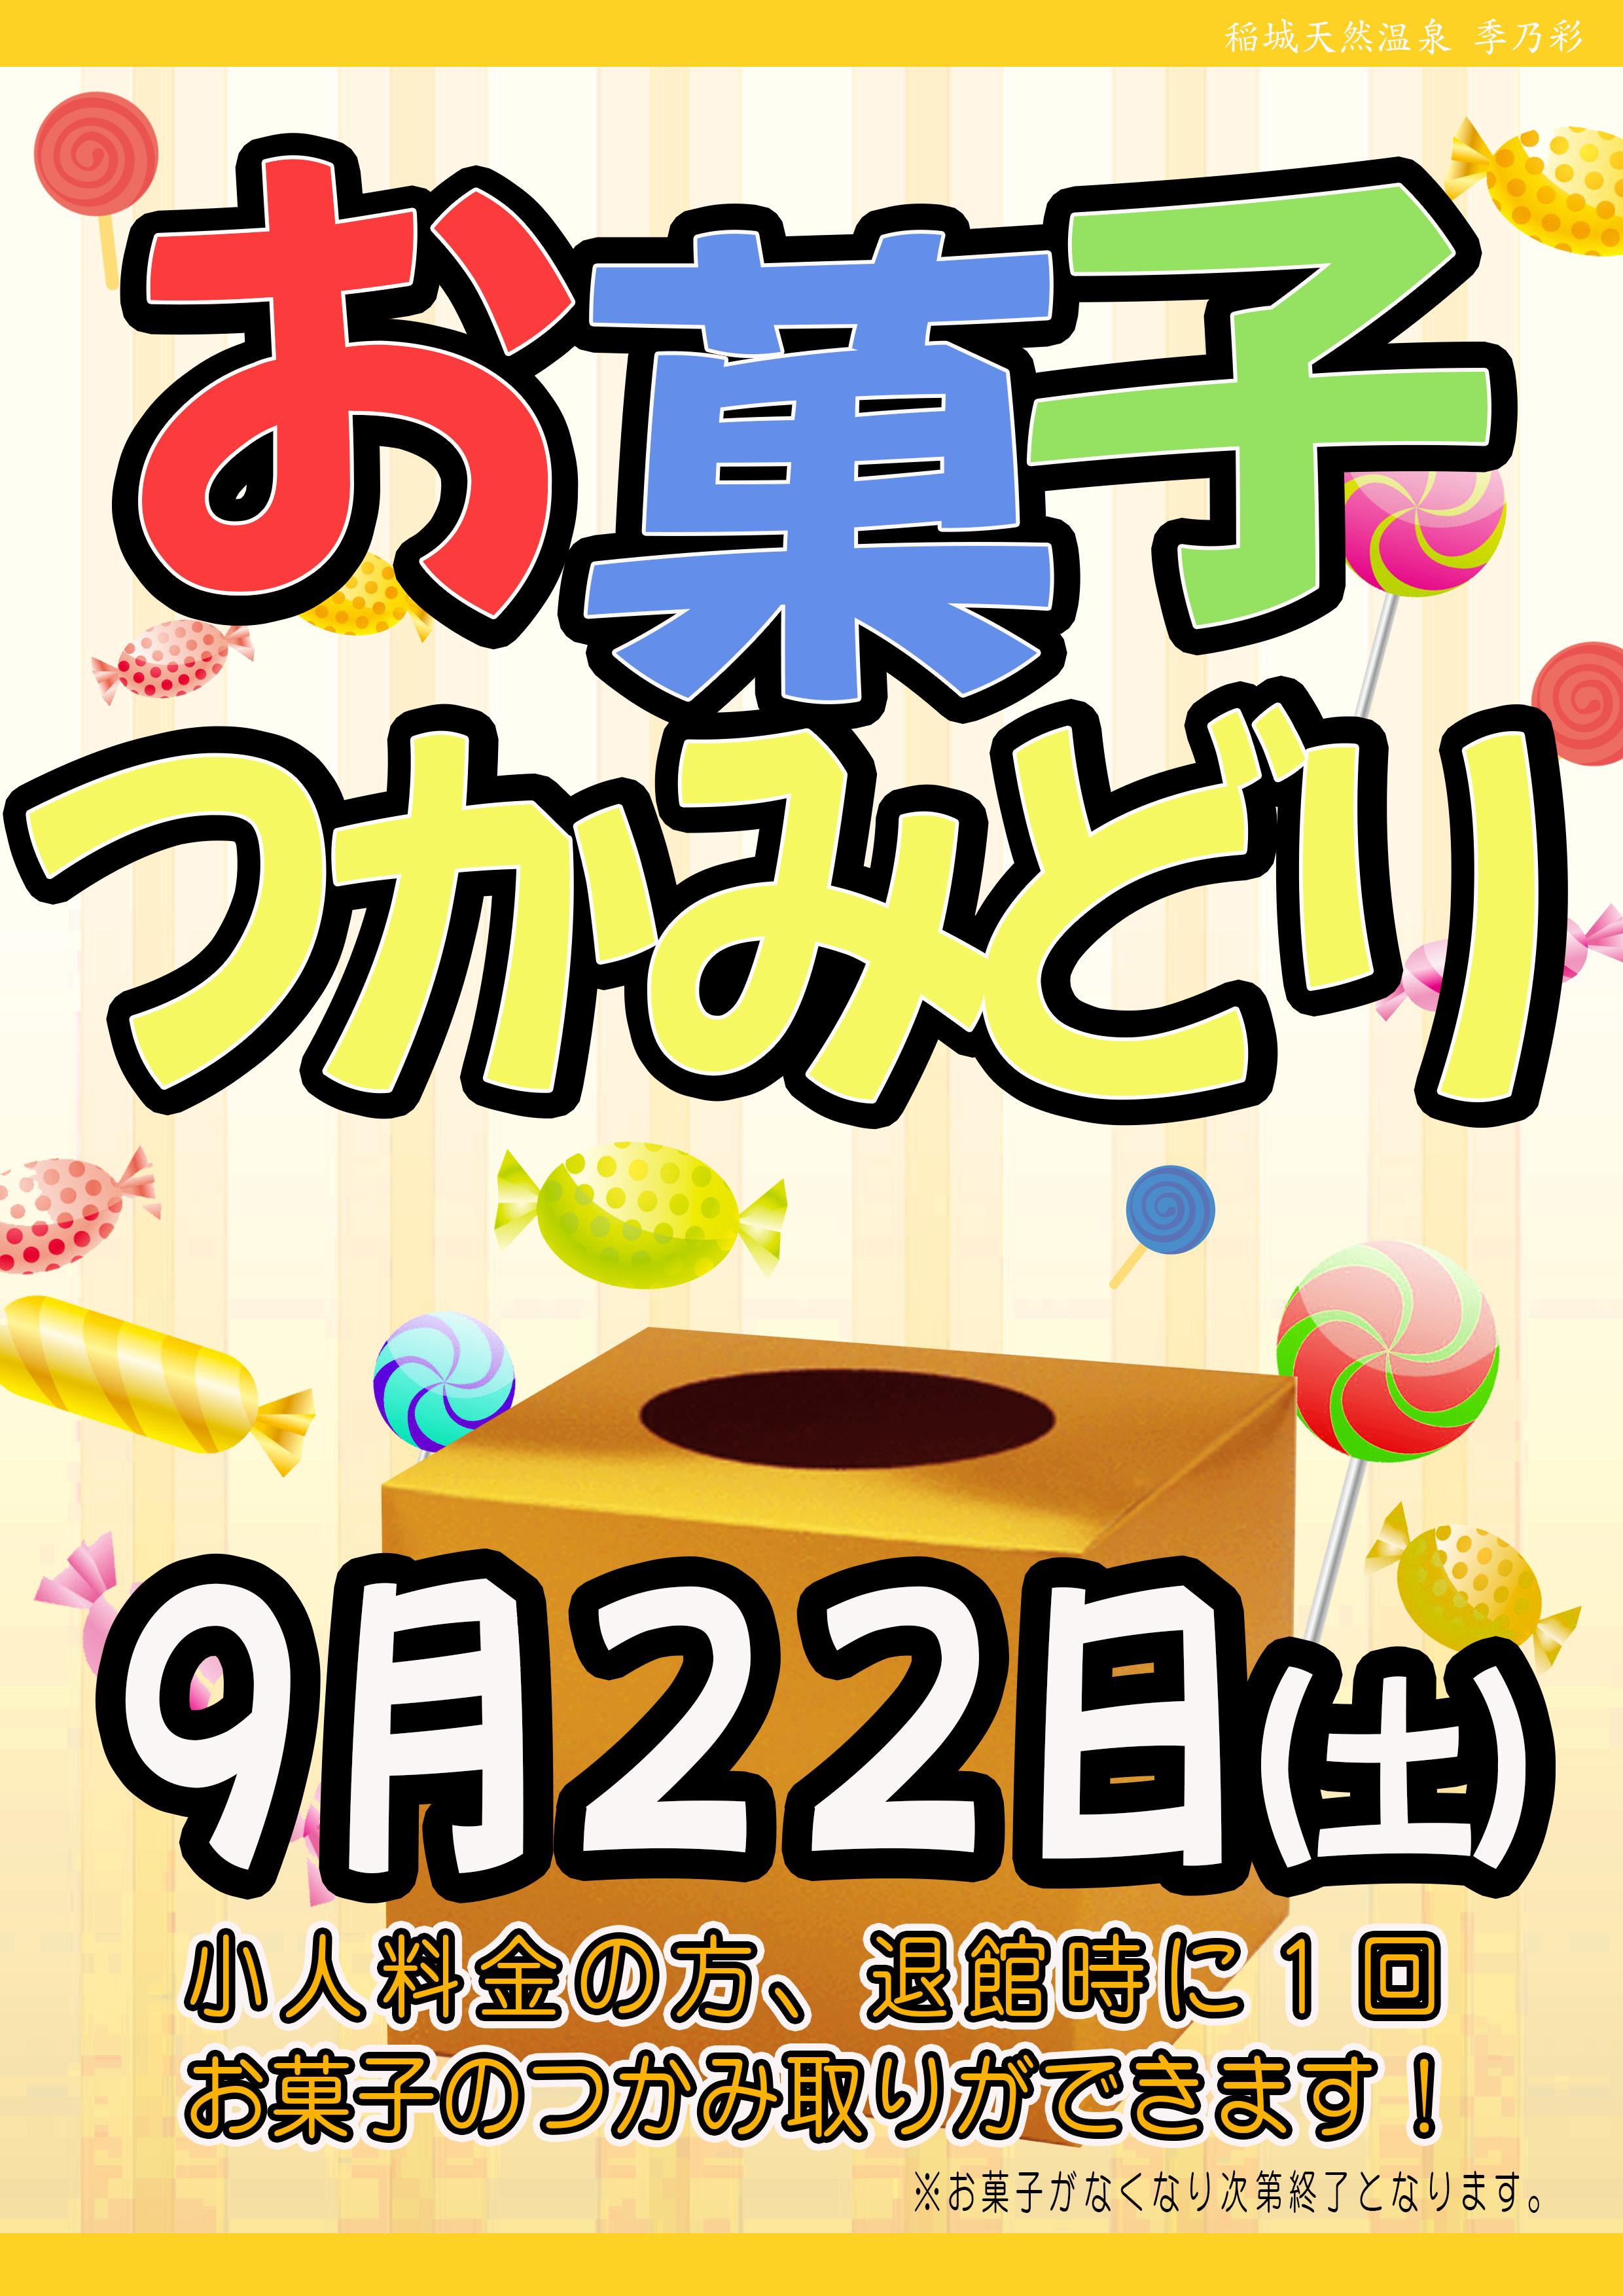 POP イベント お菓子つかみ取り 黄色